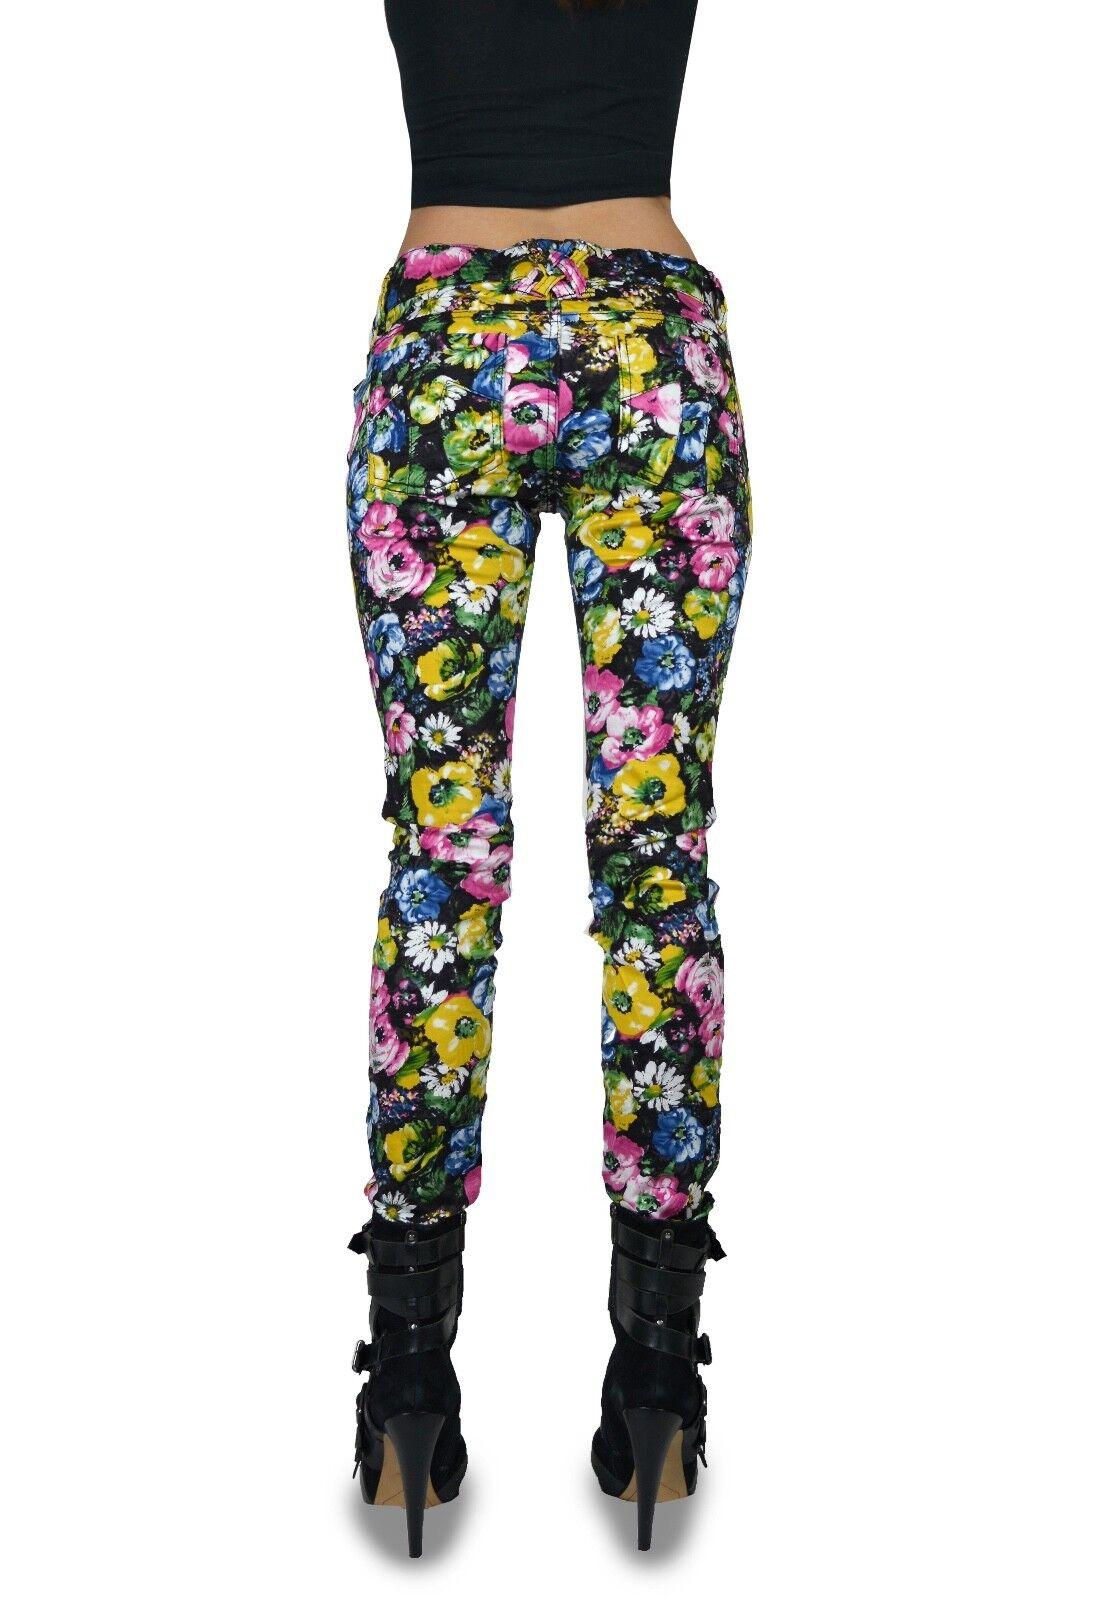 TRIPP PUNK EMO GOTHIC ROCKER ELECTRIC FLOWER PRINTED JEANS PANTS HIPPIE IL8833P Clothing, Shoes & Accessories